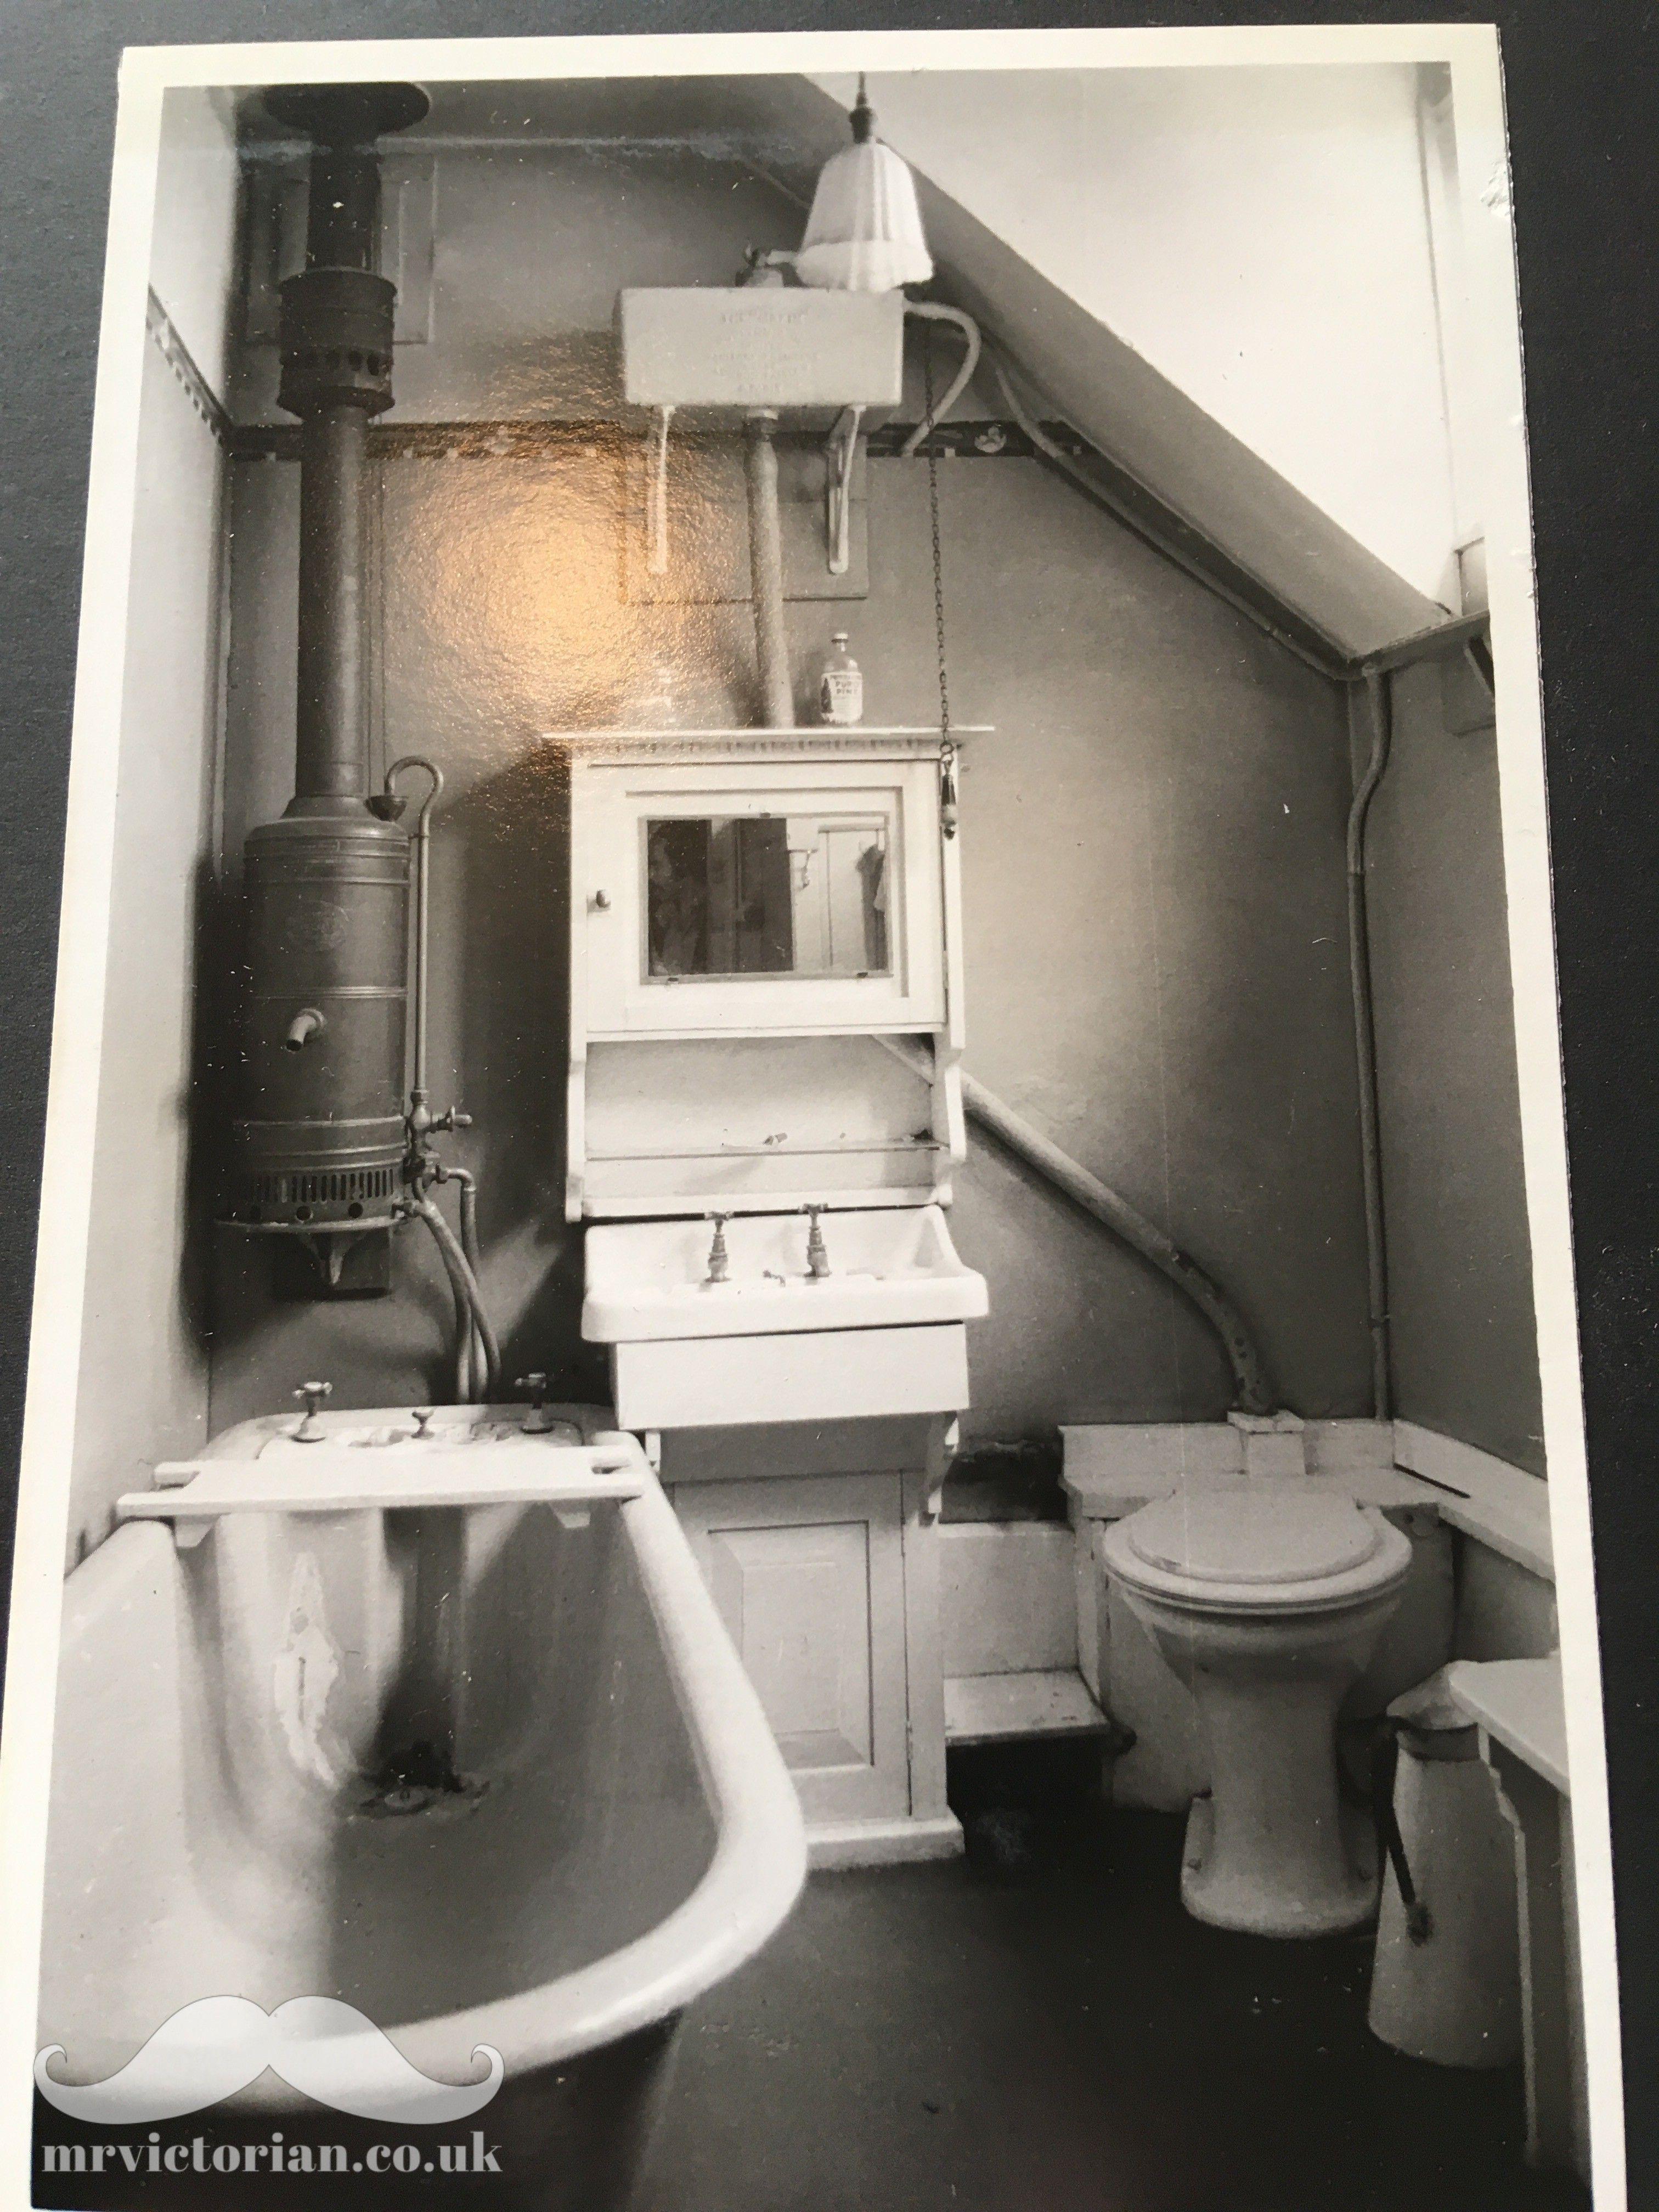 Original Edwardian Bathroom At Little Holland House Carshalton London With Antique Sink High Cister Victorian Bathroom Edwardian Bathroom Vintage Bathrooms